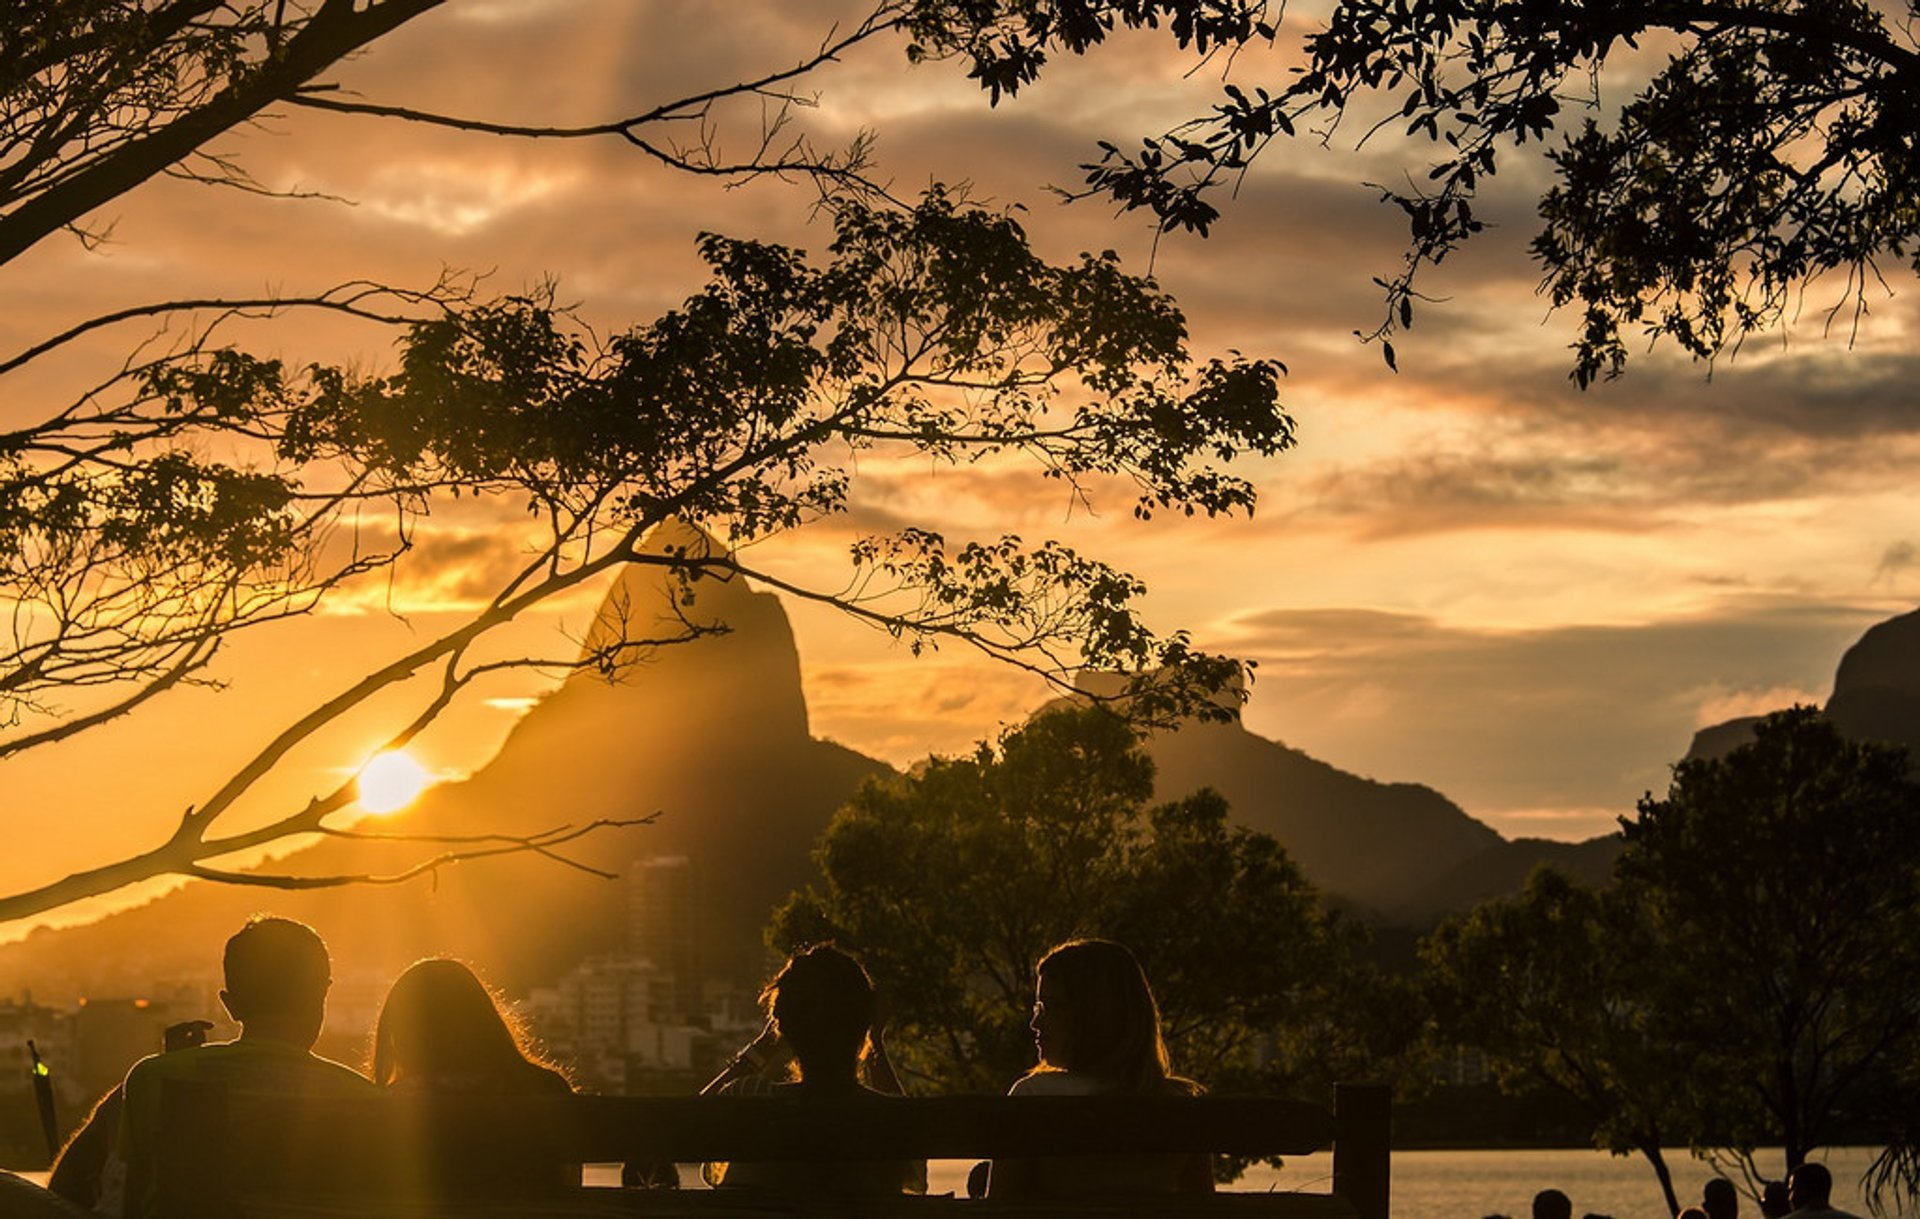 Watching the Sunset in Rio de Janeiro - Best Season 2019